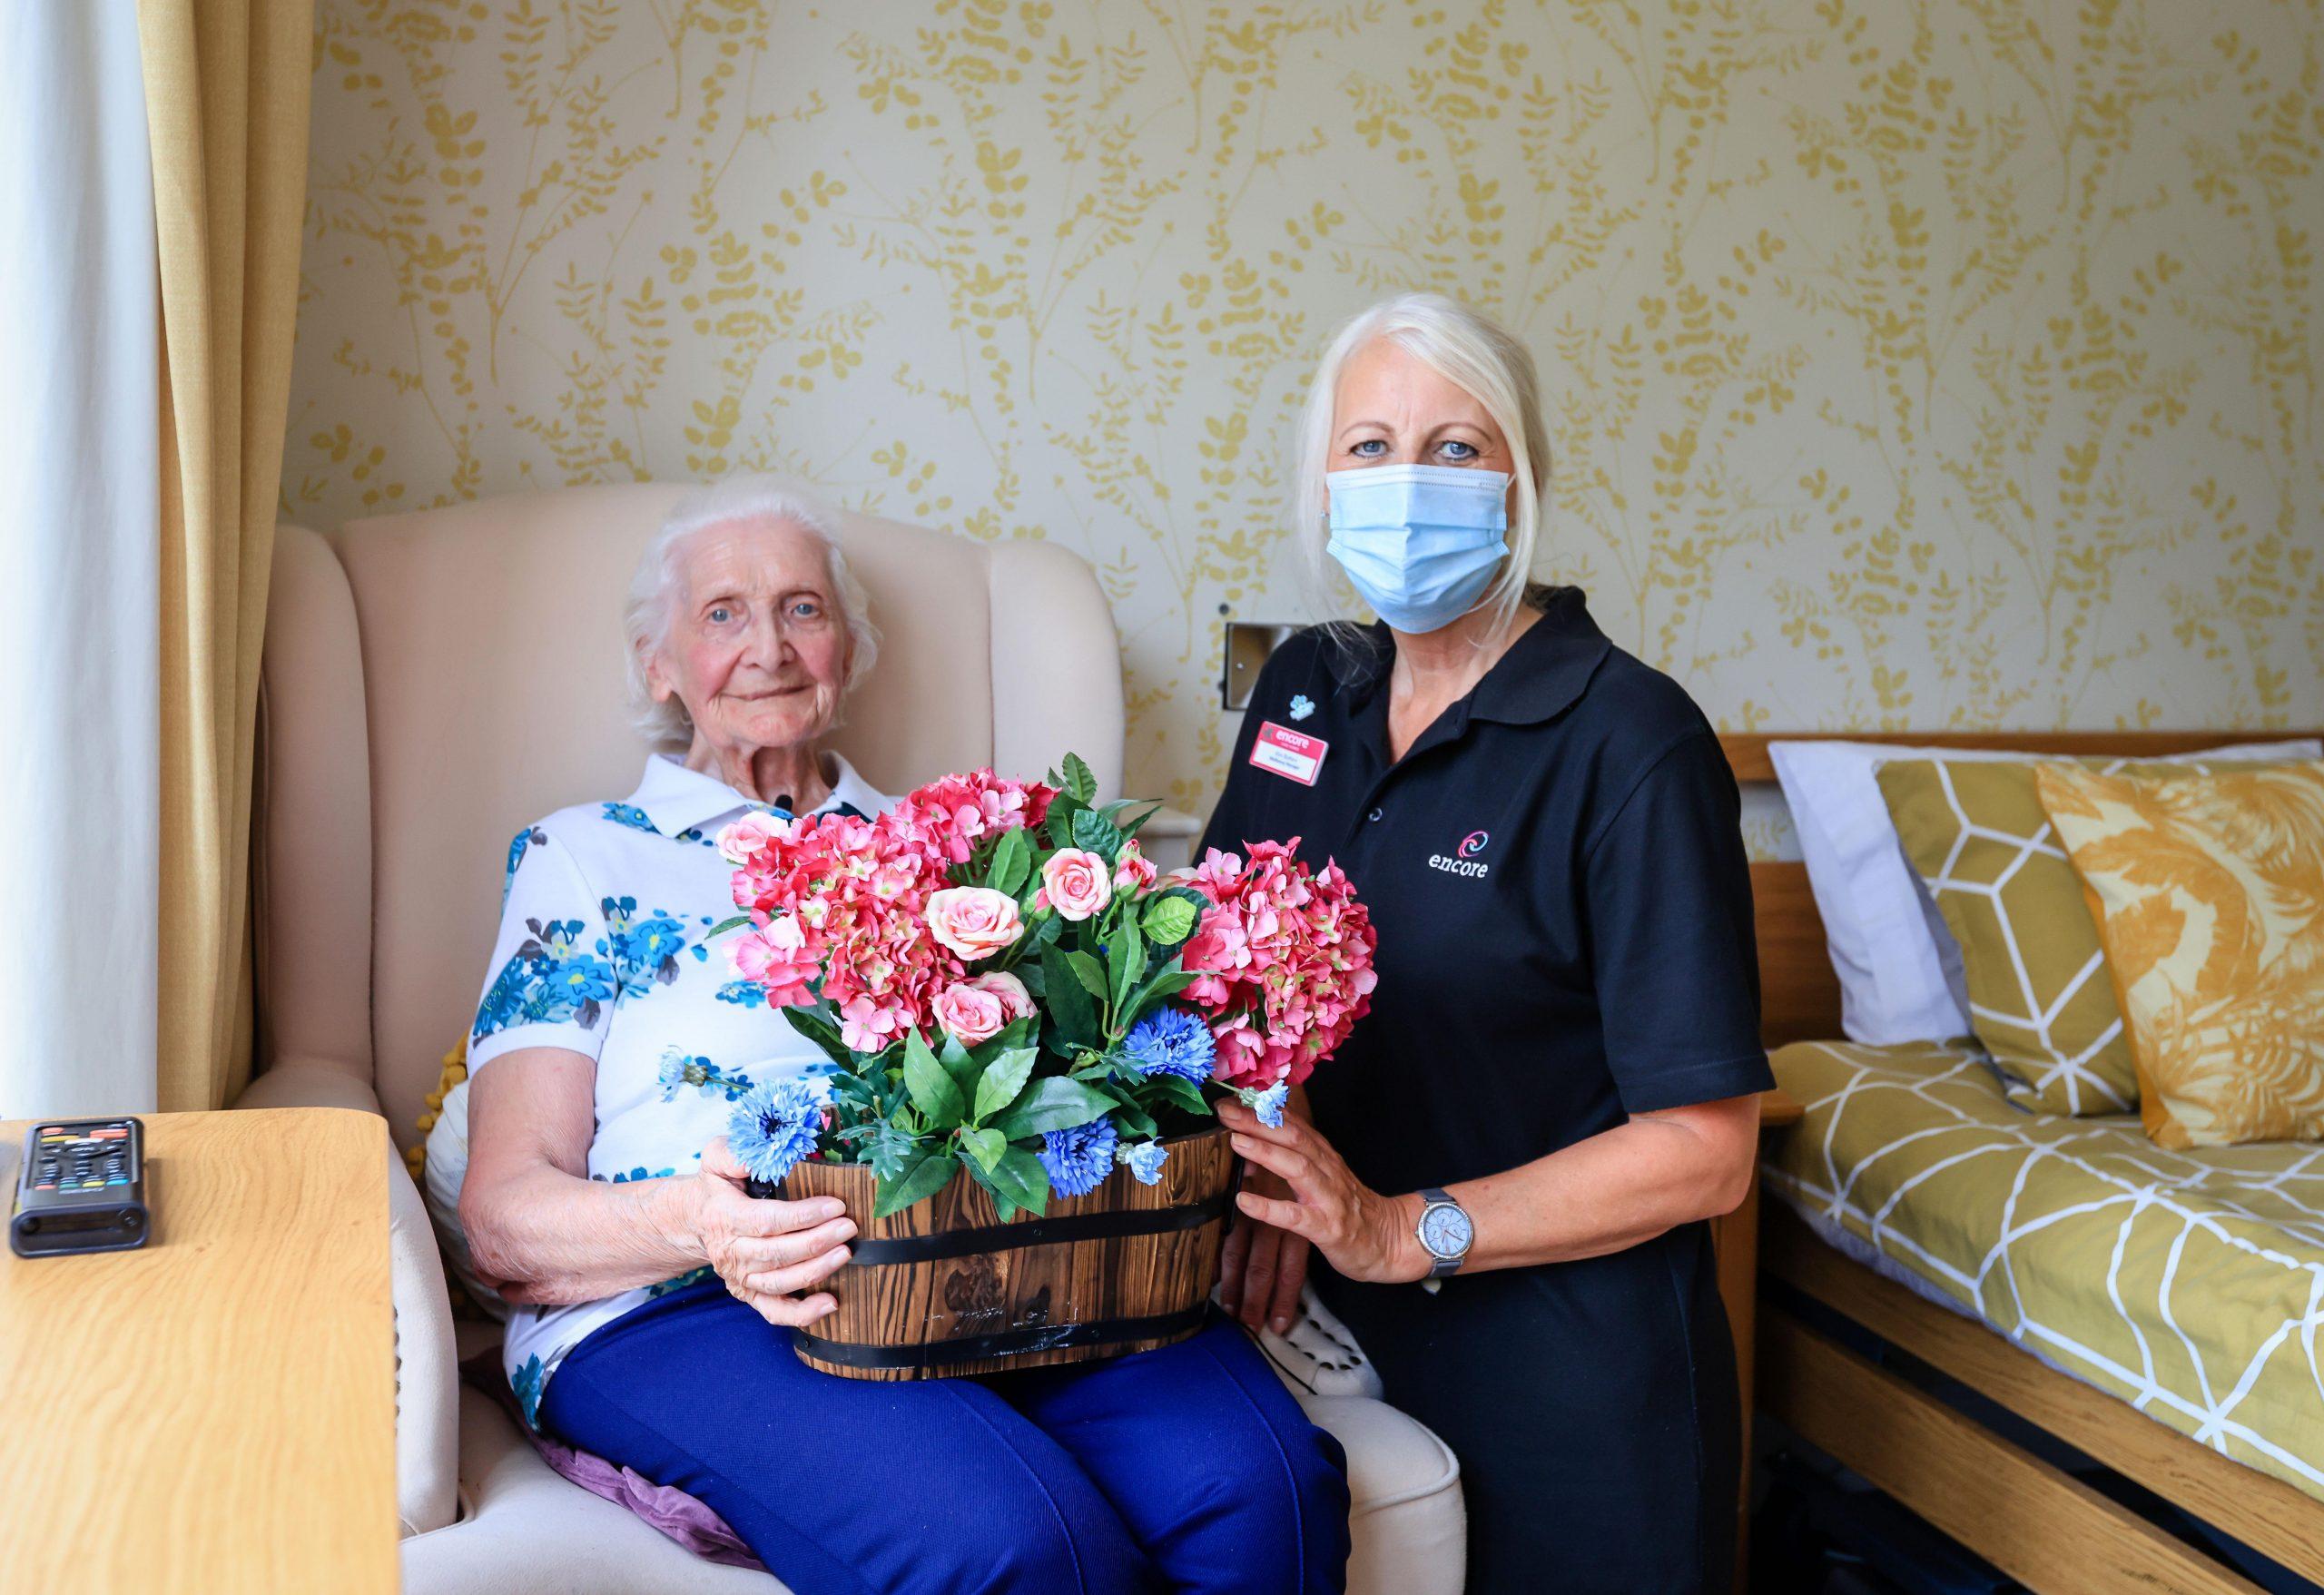 Rita's short summer stay at encore care homes